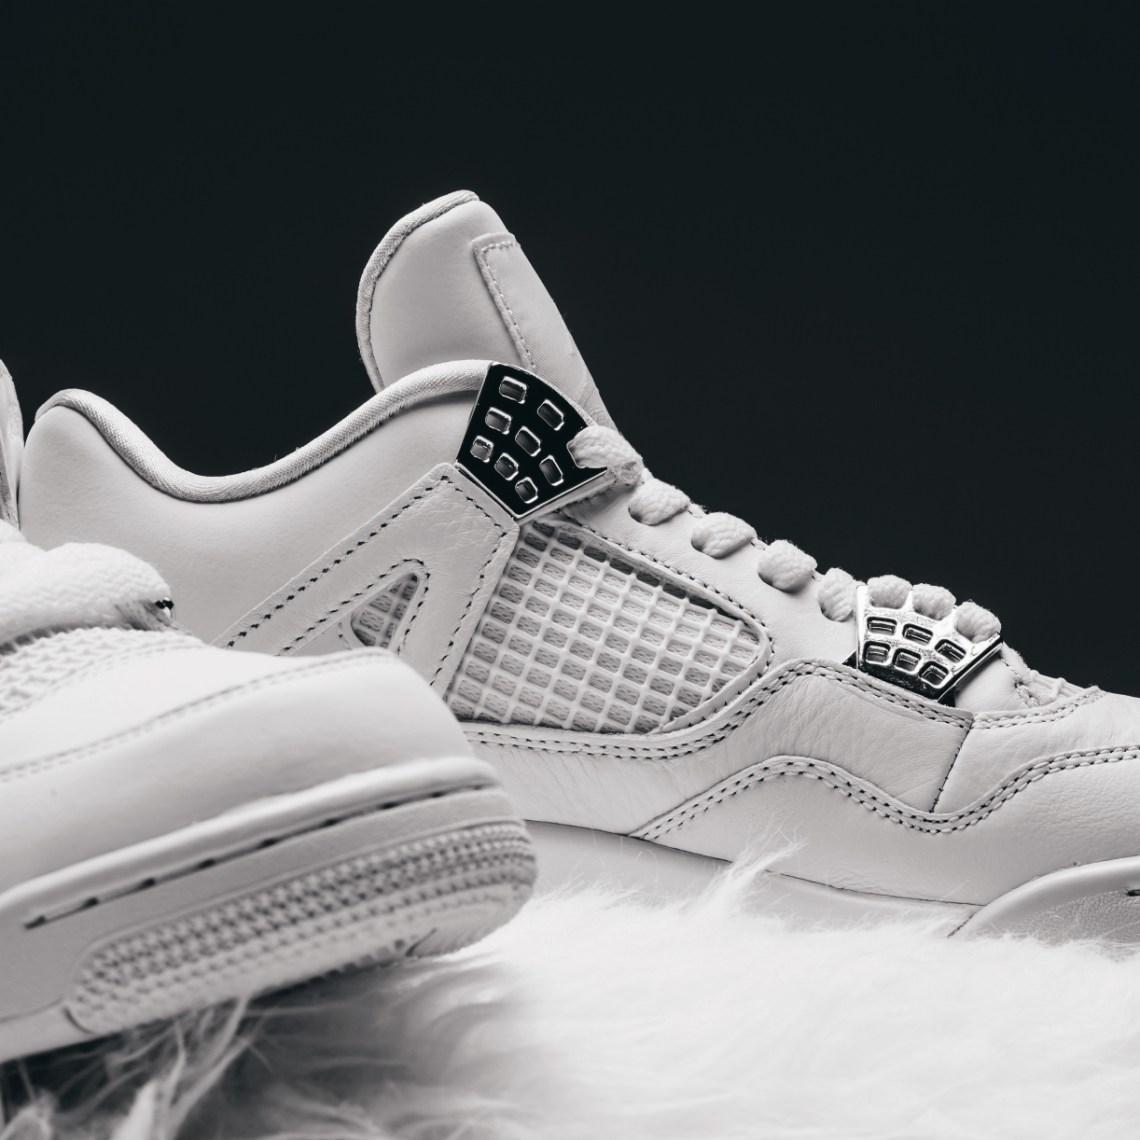 Air Jordan 4 Quot Pure Money Quot Returns Next Month Nice Kicks